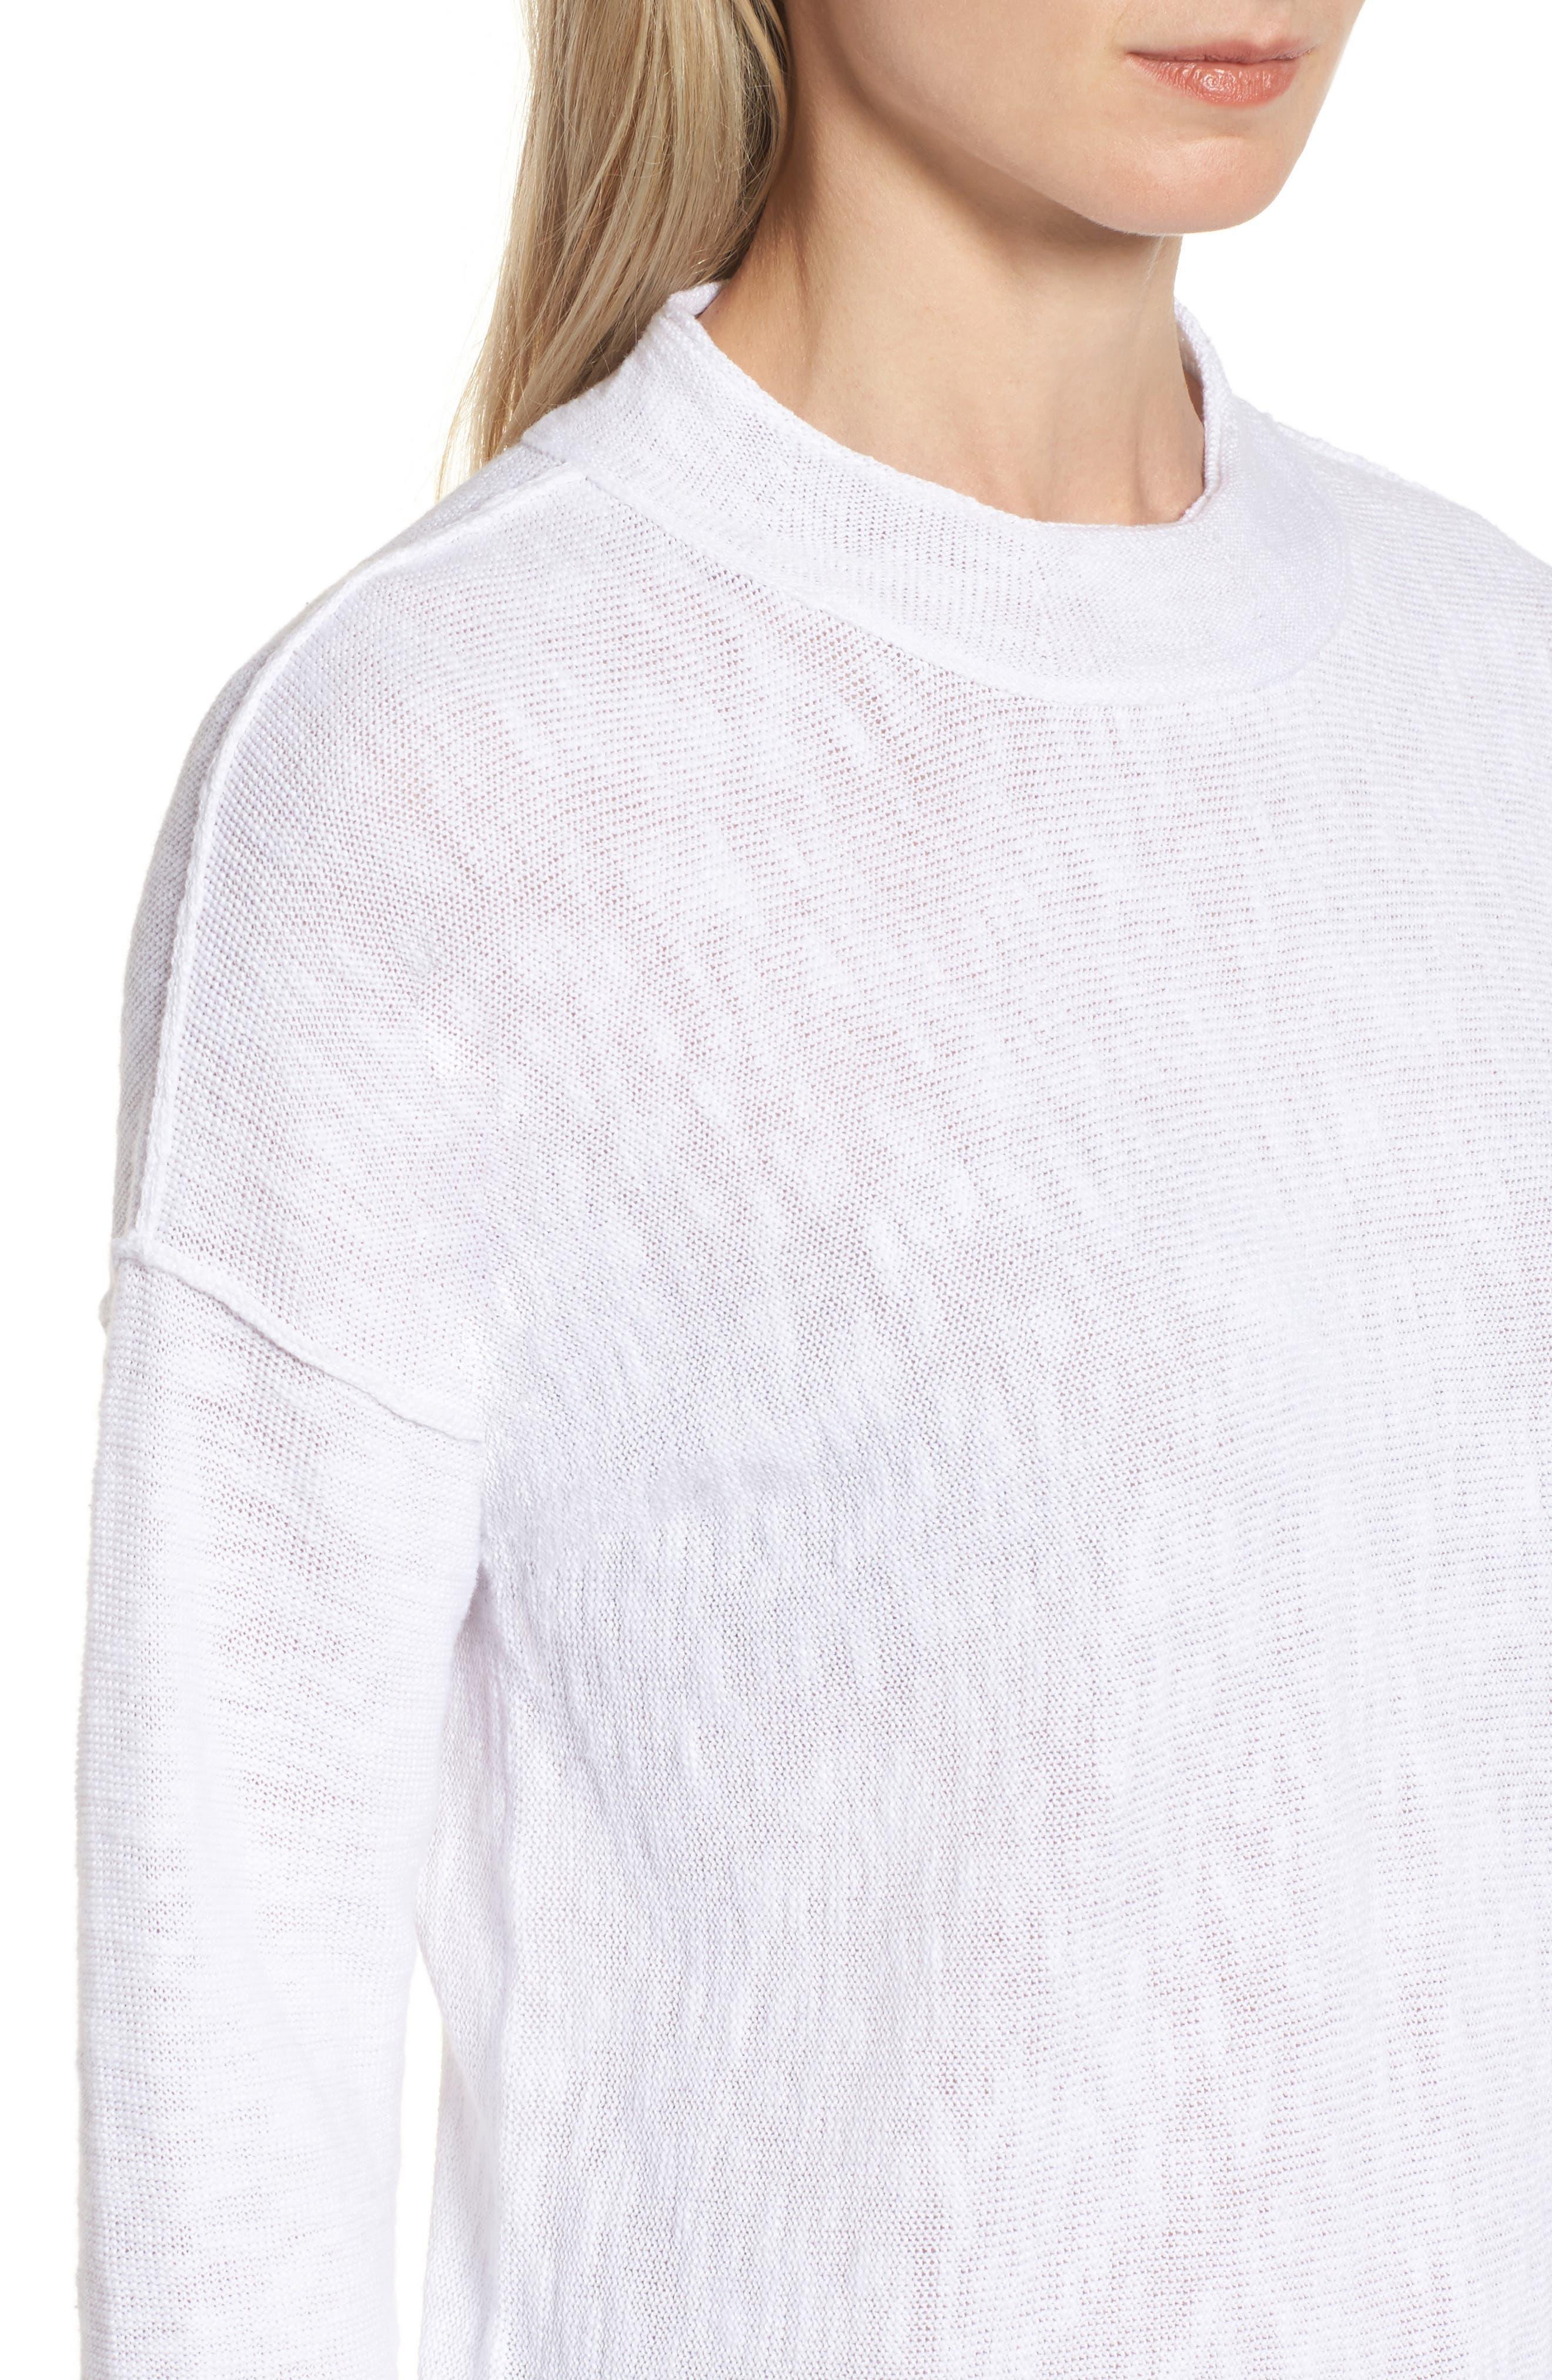 Organic Linen & Cotton Sweater,                             Alternate thumbnail 4, color,                             100